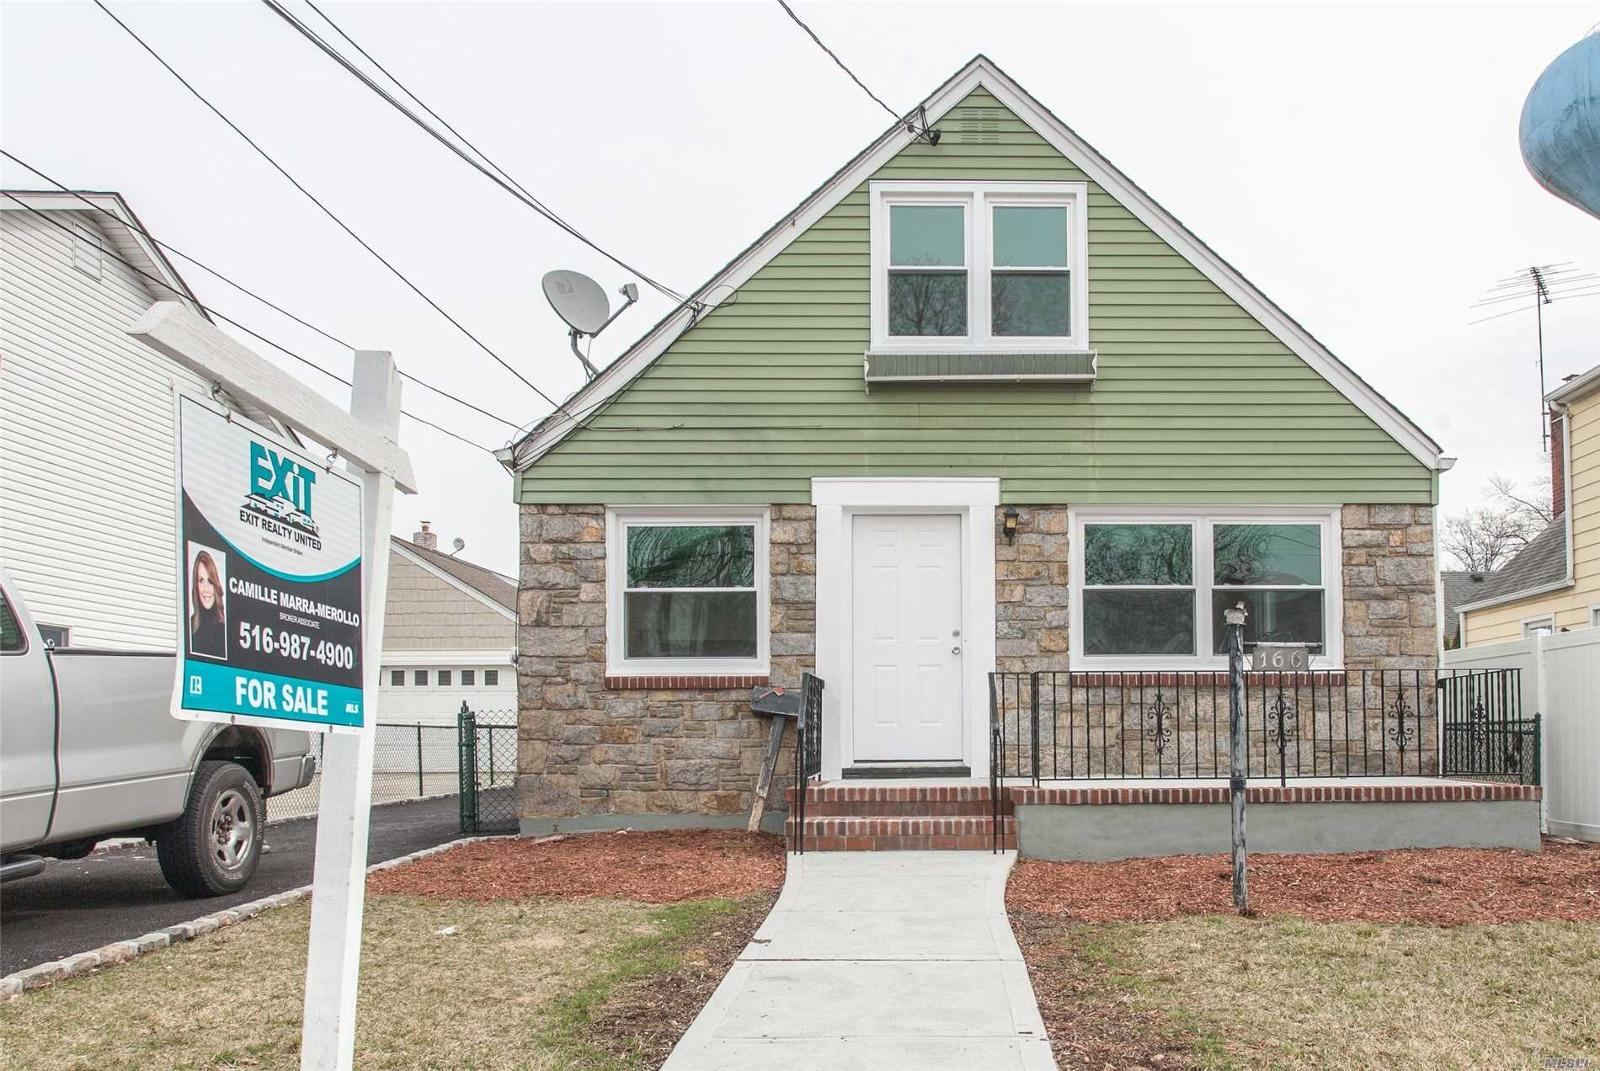 166 Caroline Ave Garden City S Ny Mls 2995644 Century 21 Real Estate